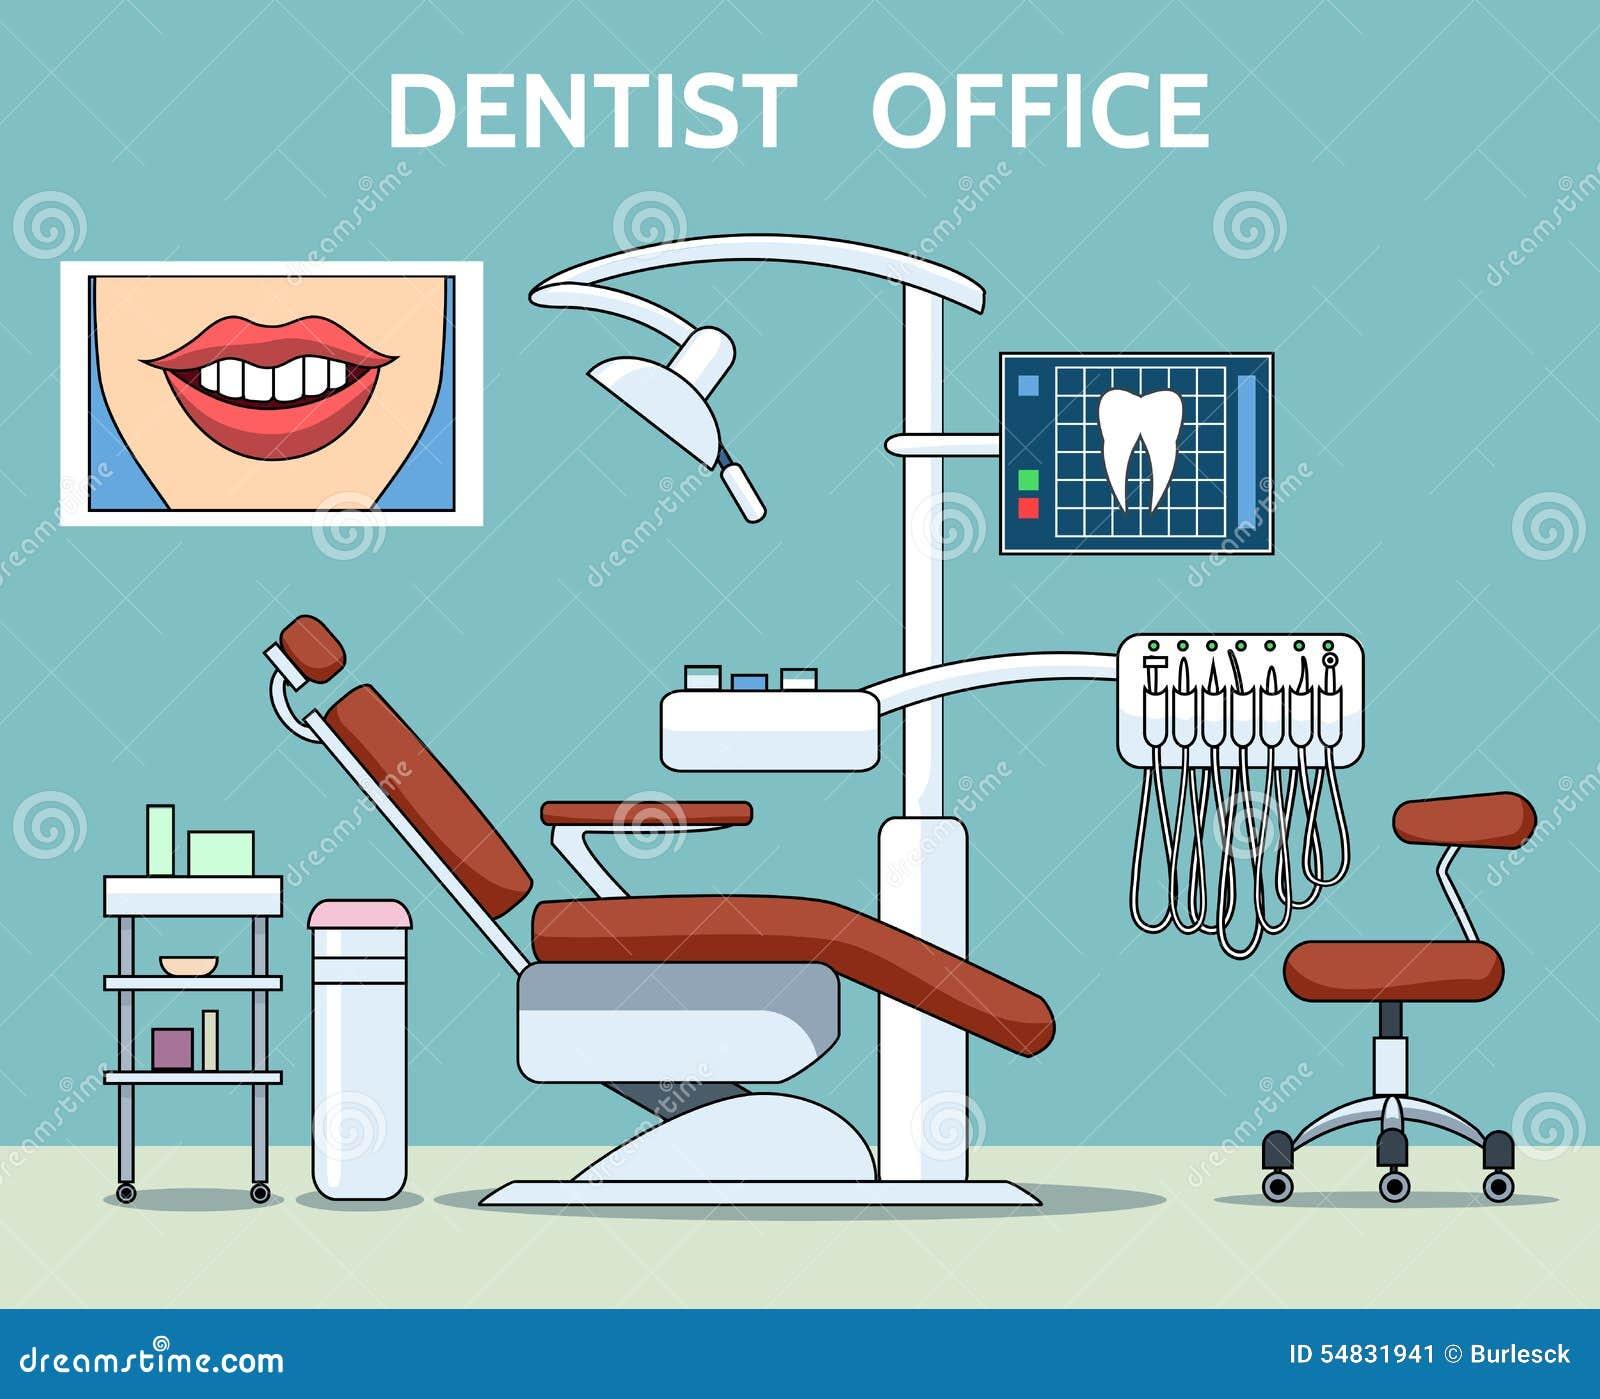 Dentist Office Stock Vector Image 54831941